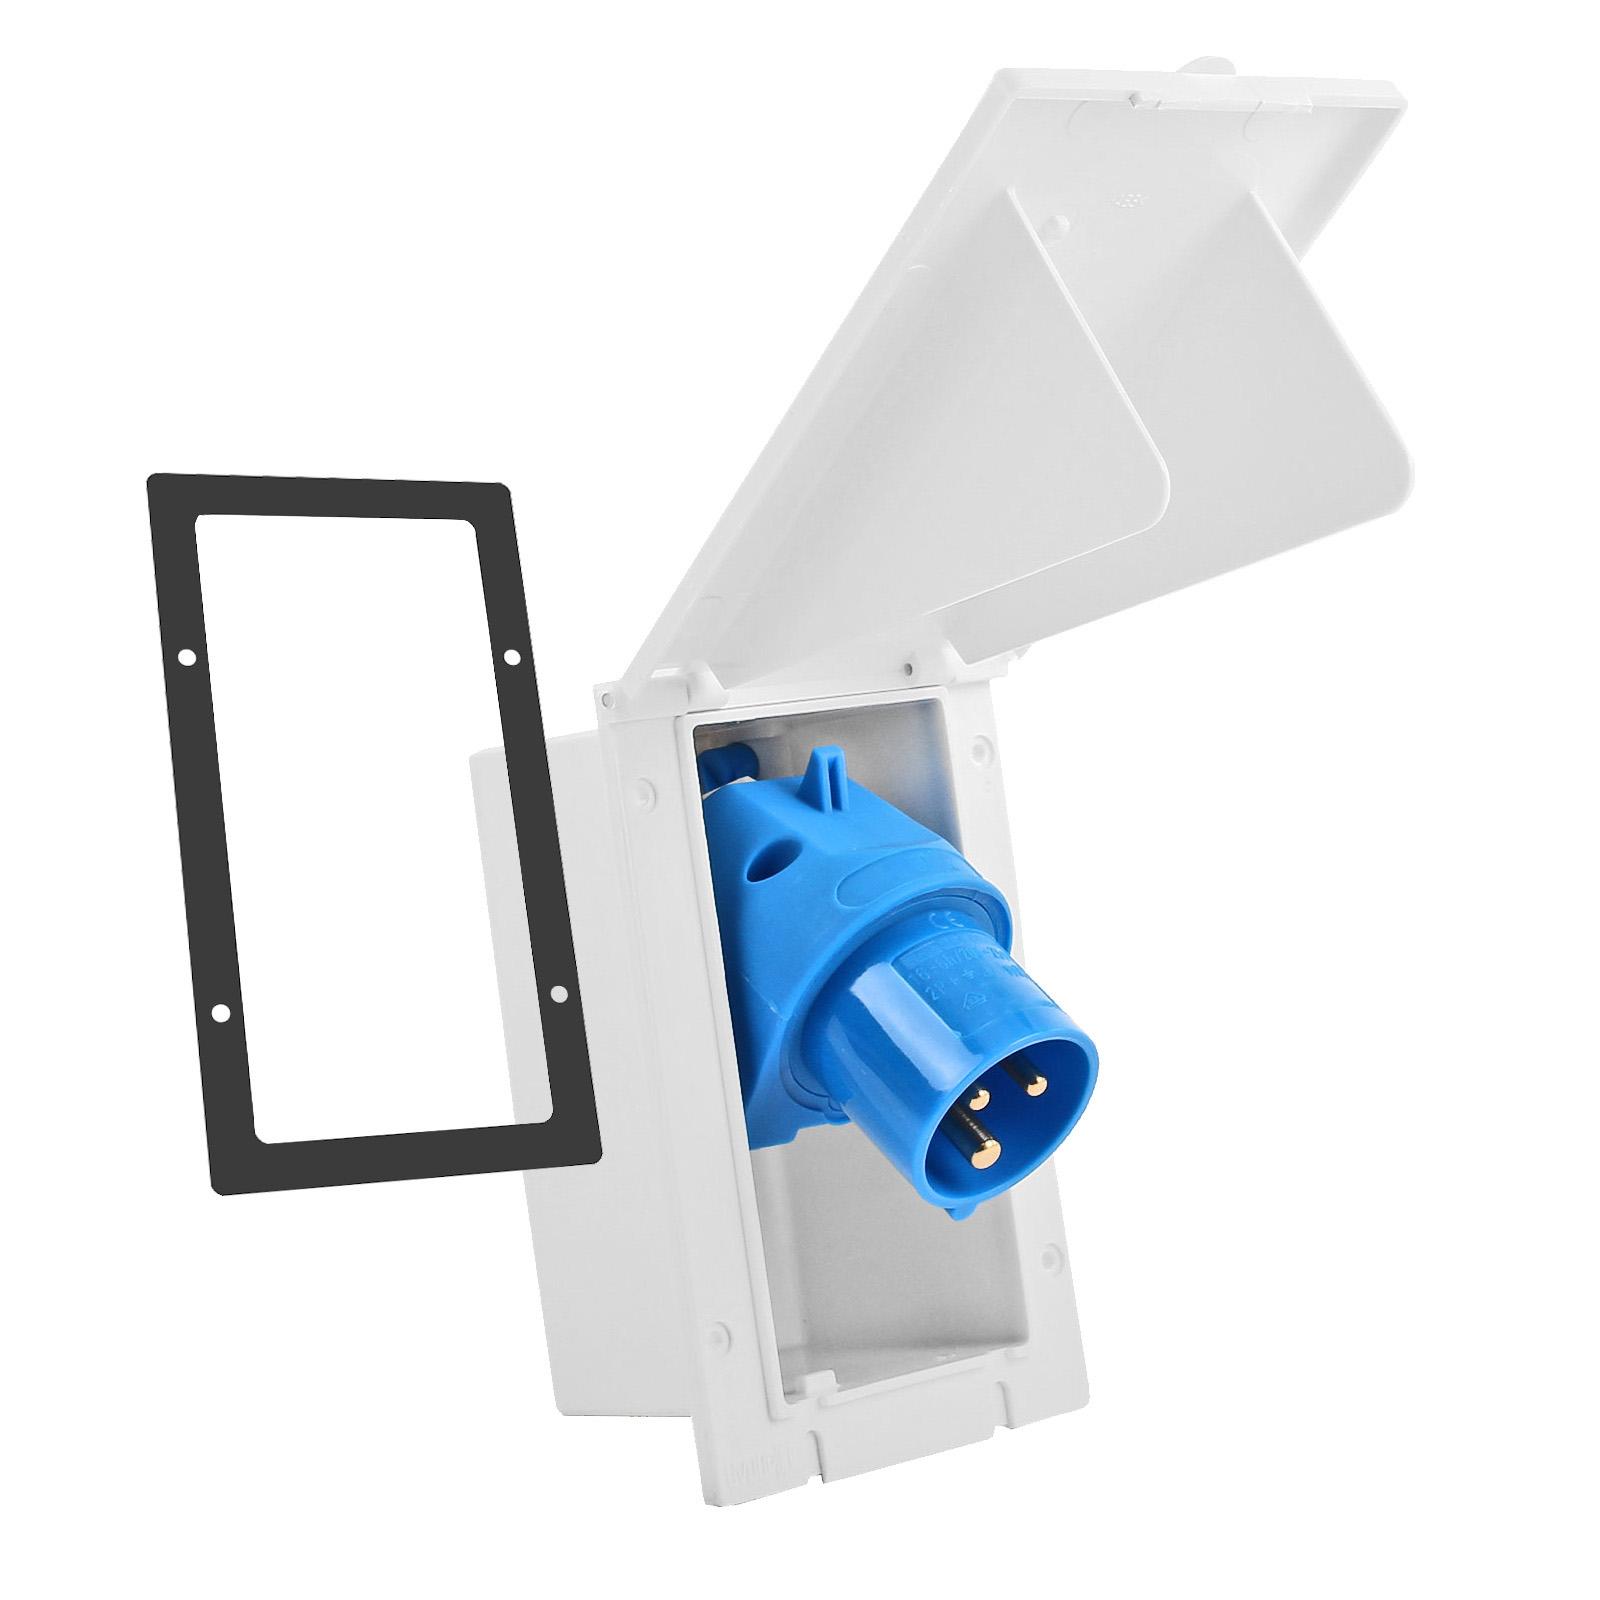 CEE Aussensteckdose weiß Spritzwasser geschützt 200-250V, 16A, 3 polig